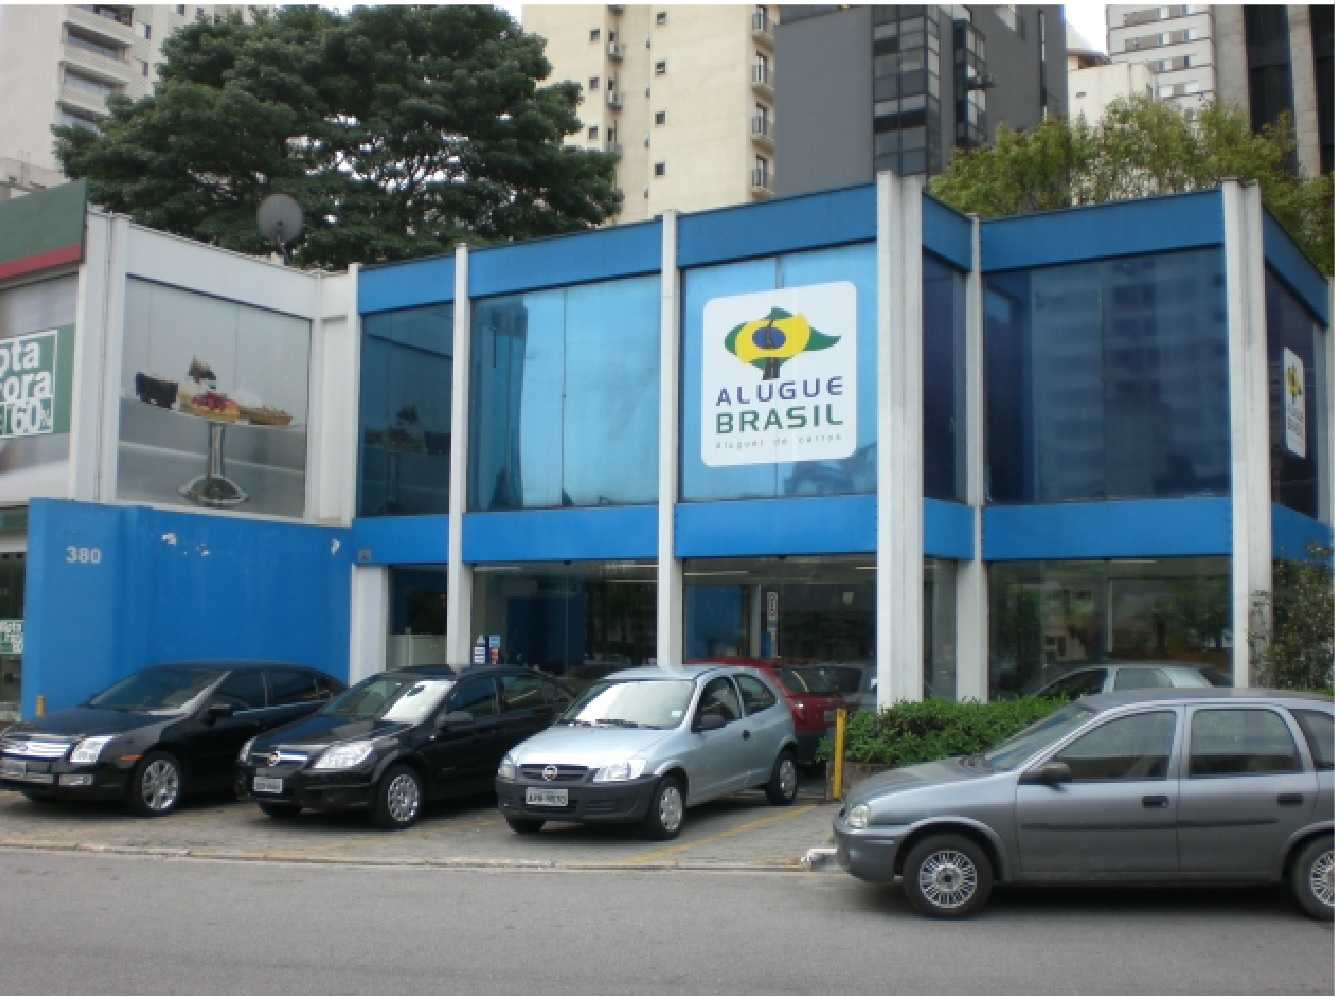 Alugue Brasil